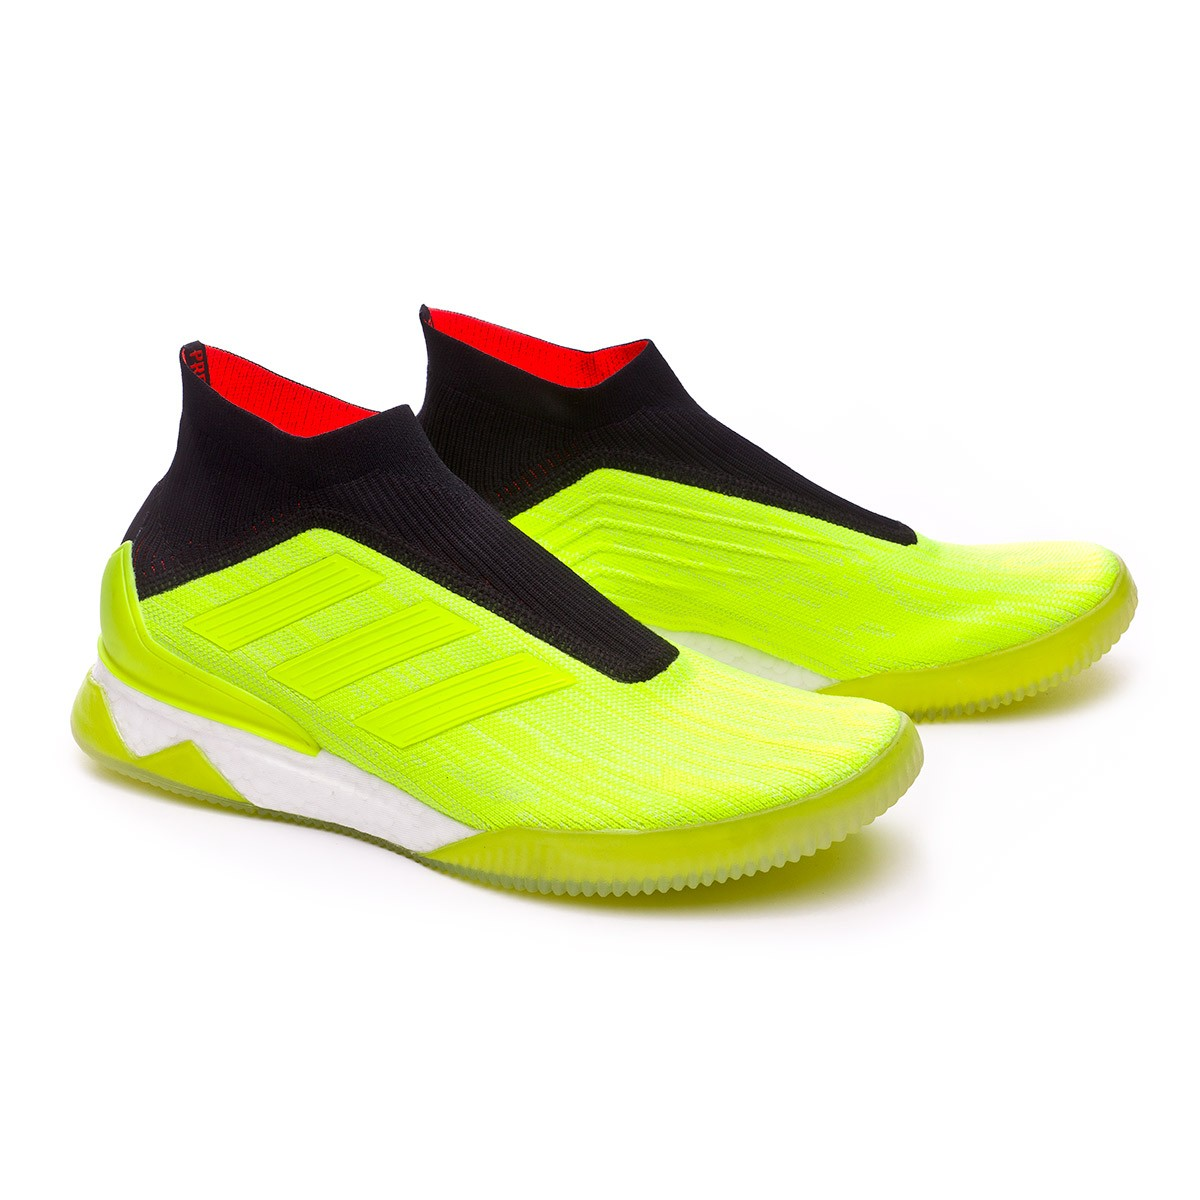 876dc98e4 Trainers adidas Predator Tango 18+ TR UltraBoost Solar yellow-Solar ...